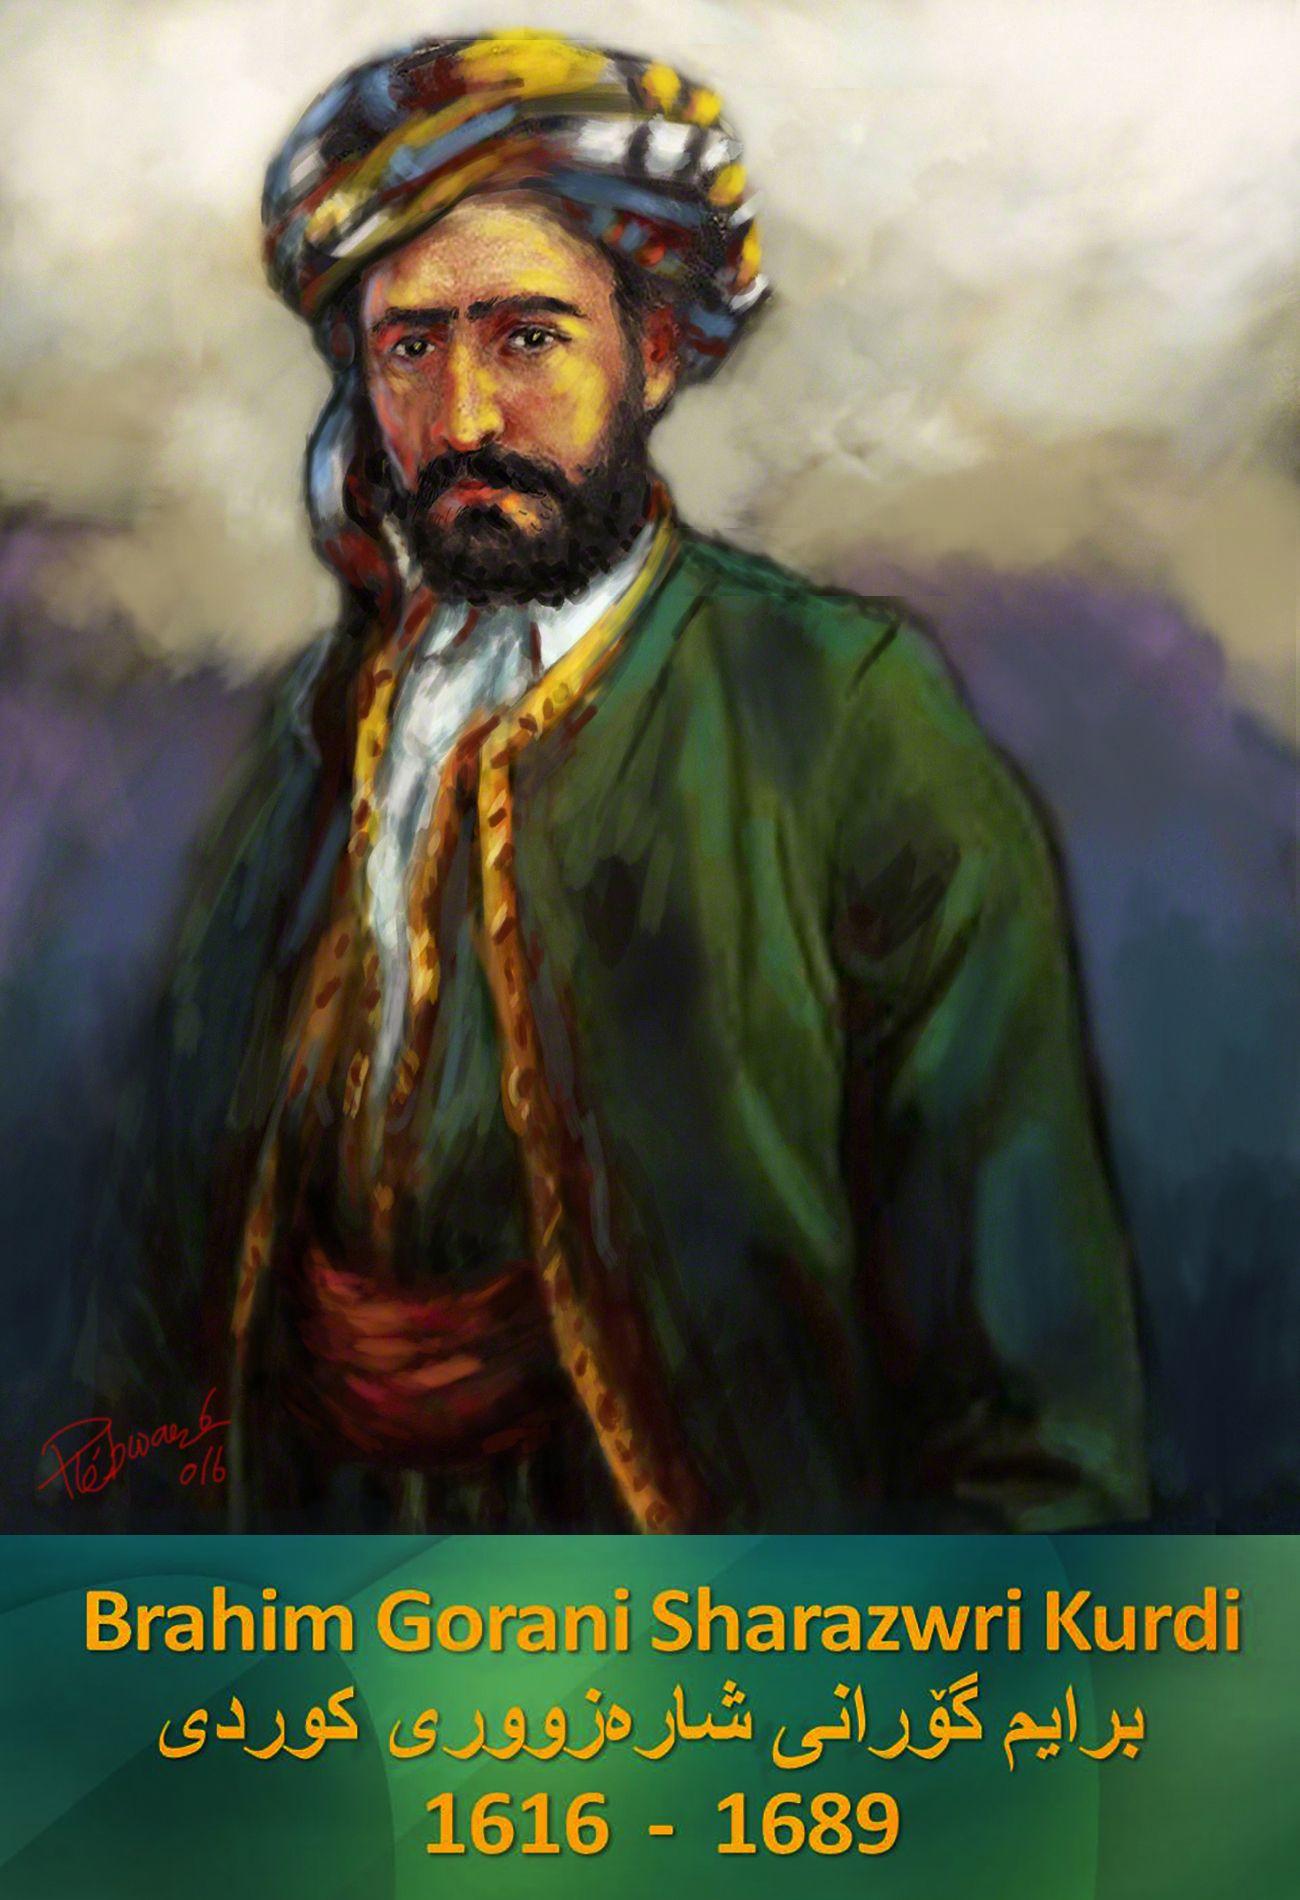 Brahim Gorani Sharazwri Kurdi 1616-1689 Kurdish Philosop Art Famous